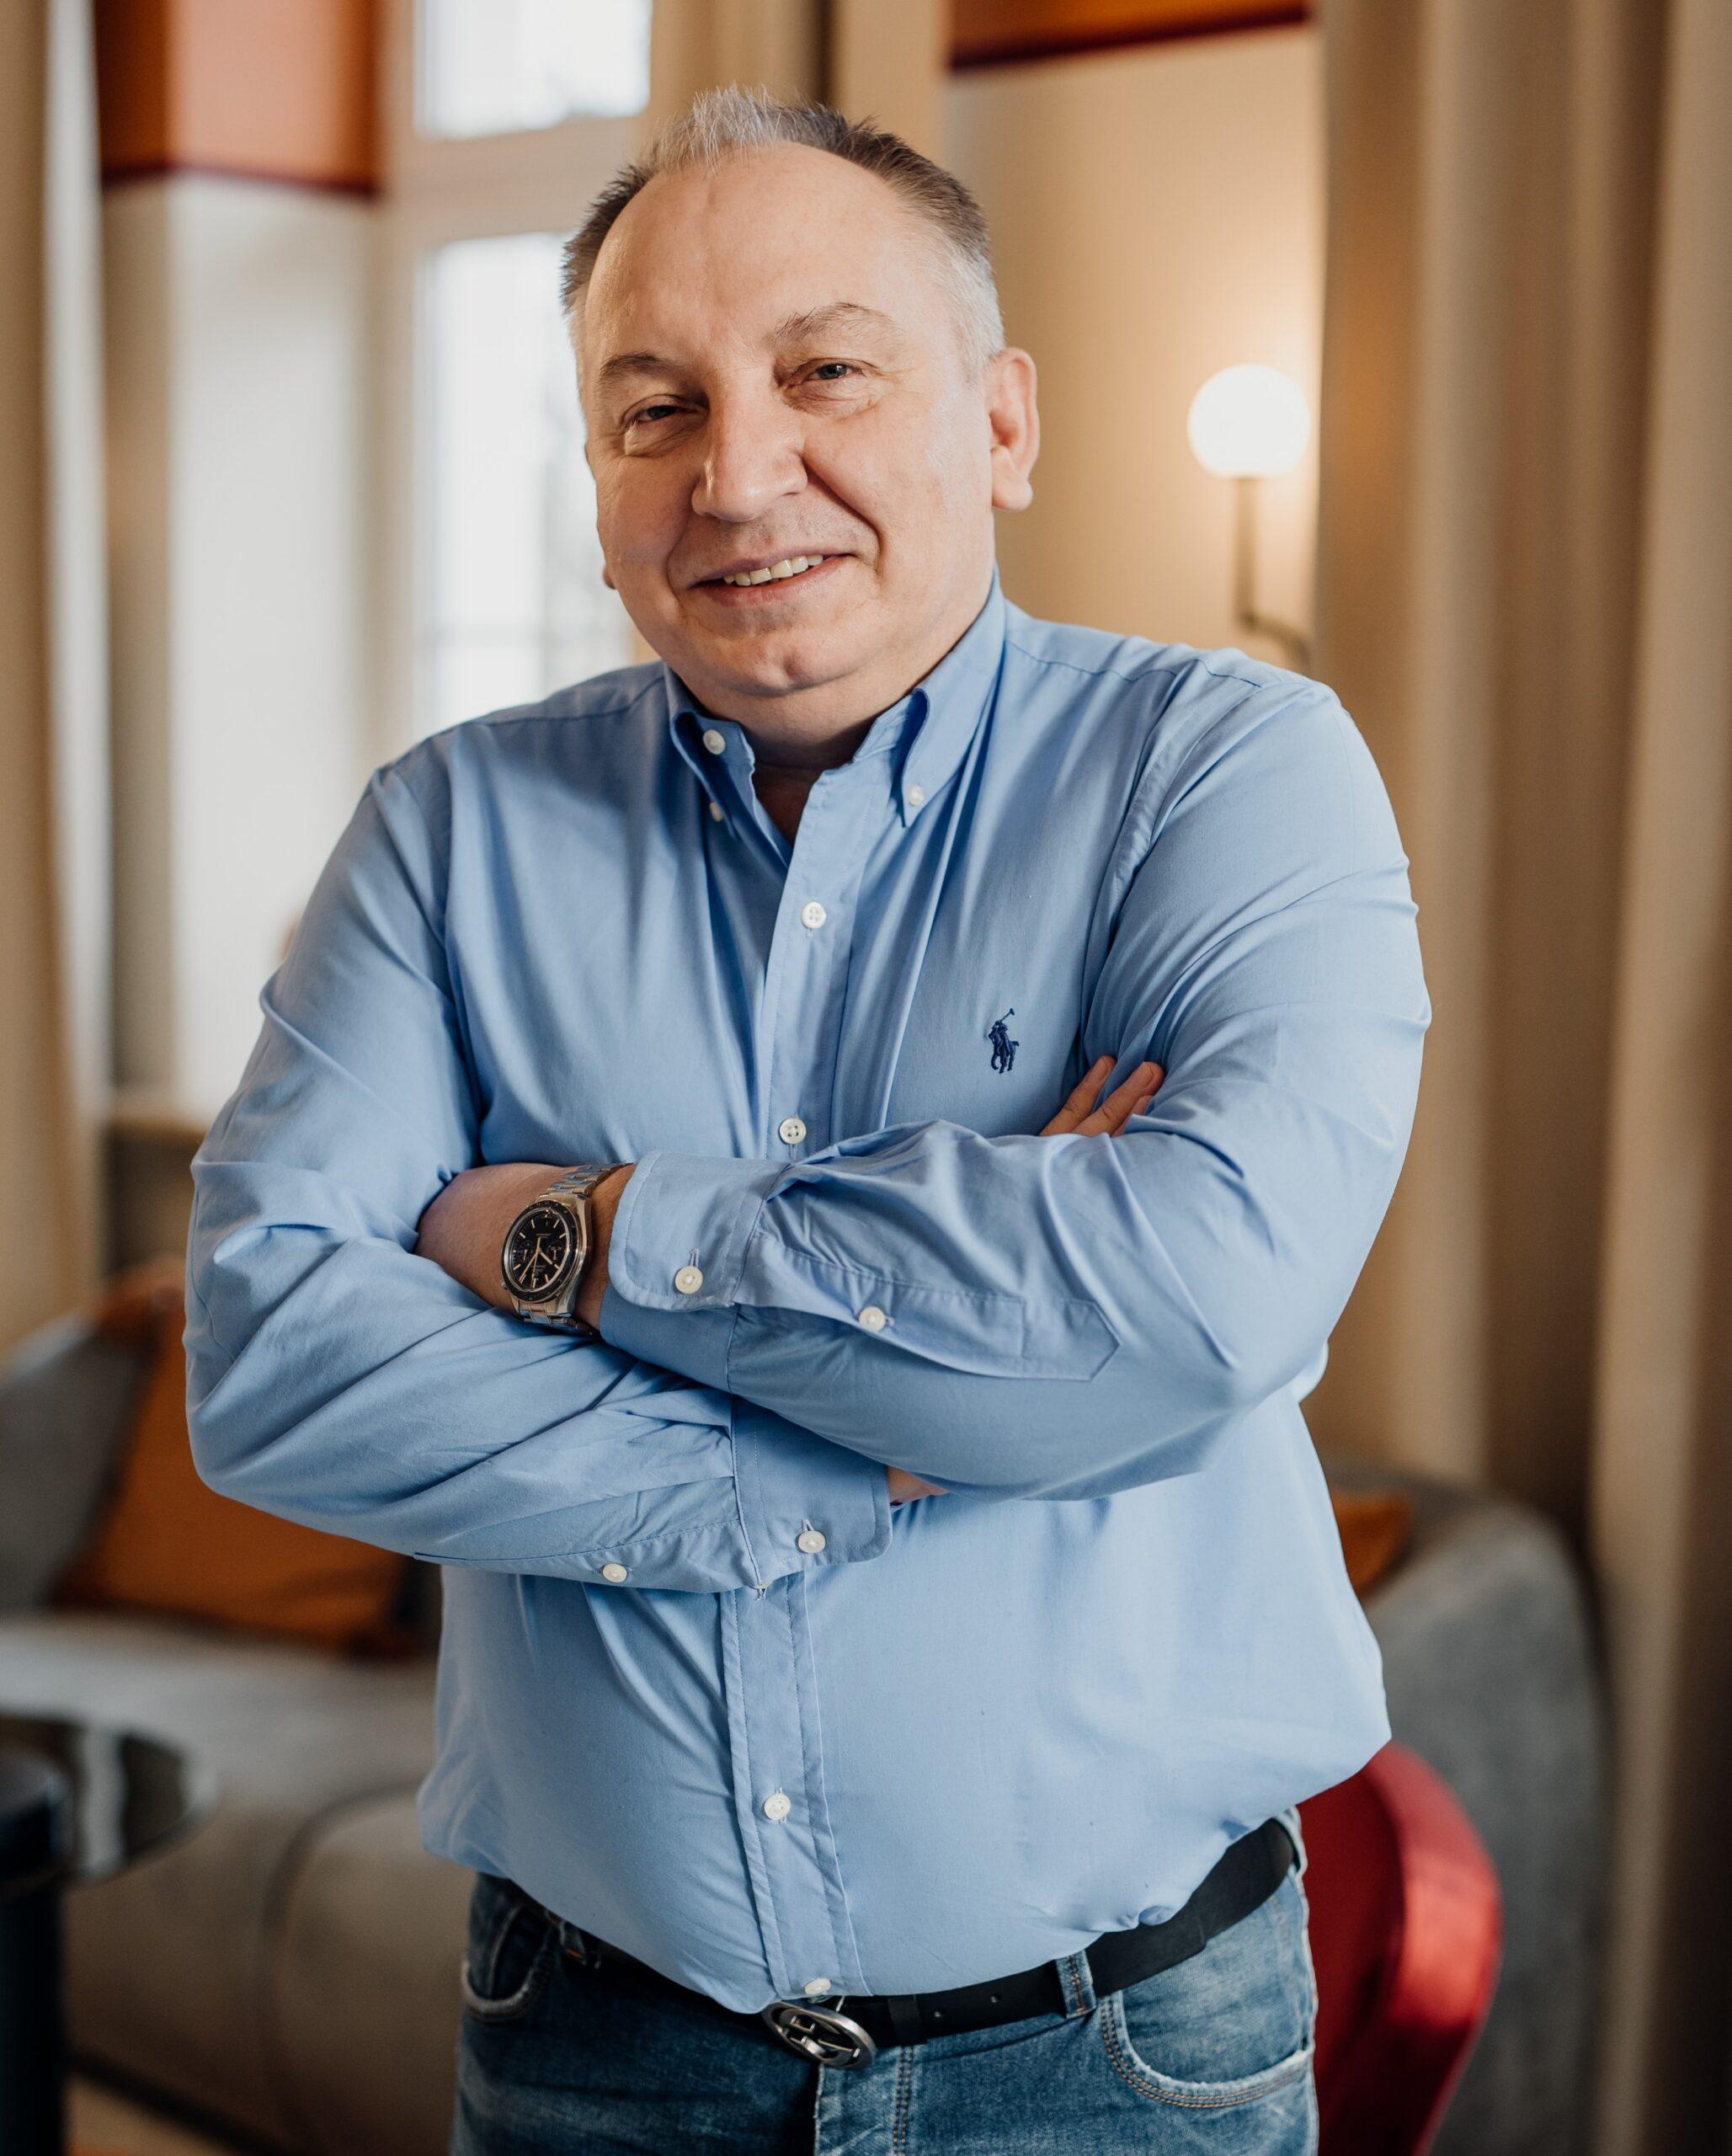 Artur Jakimiuk